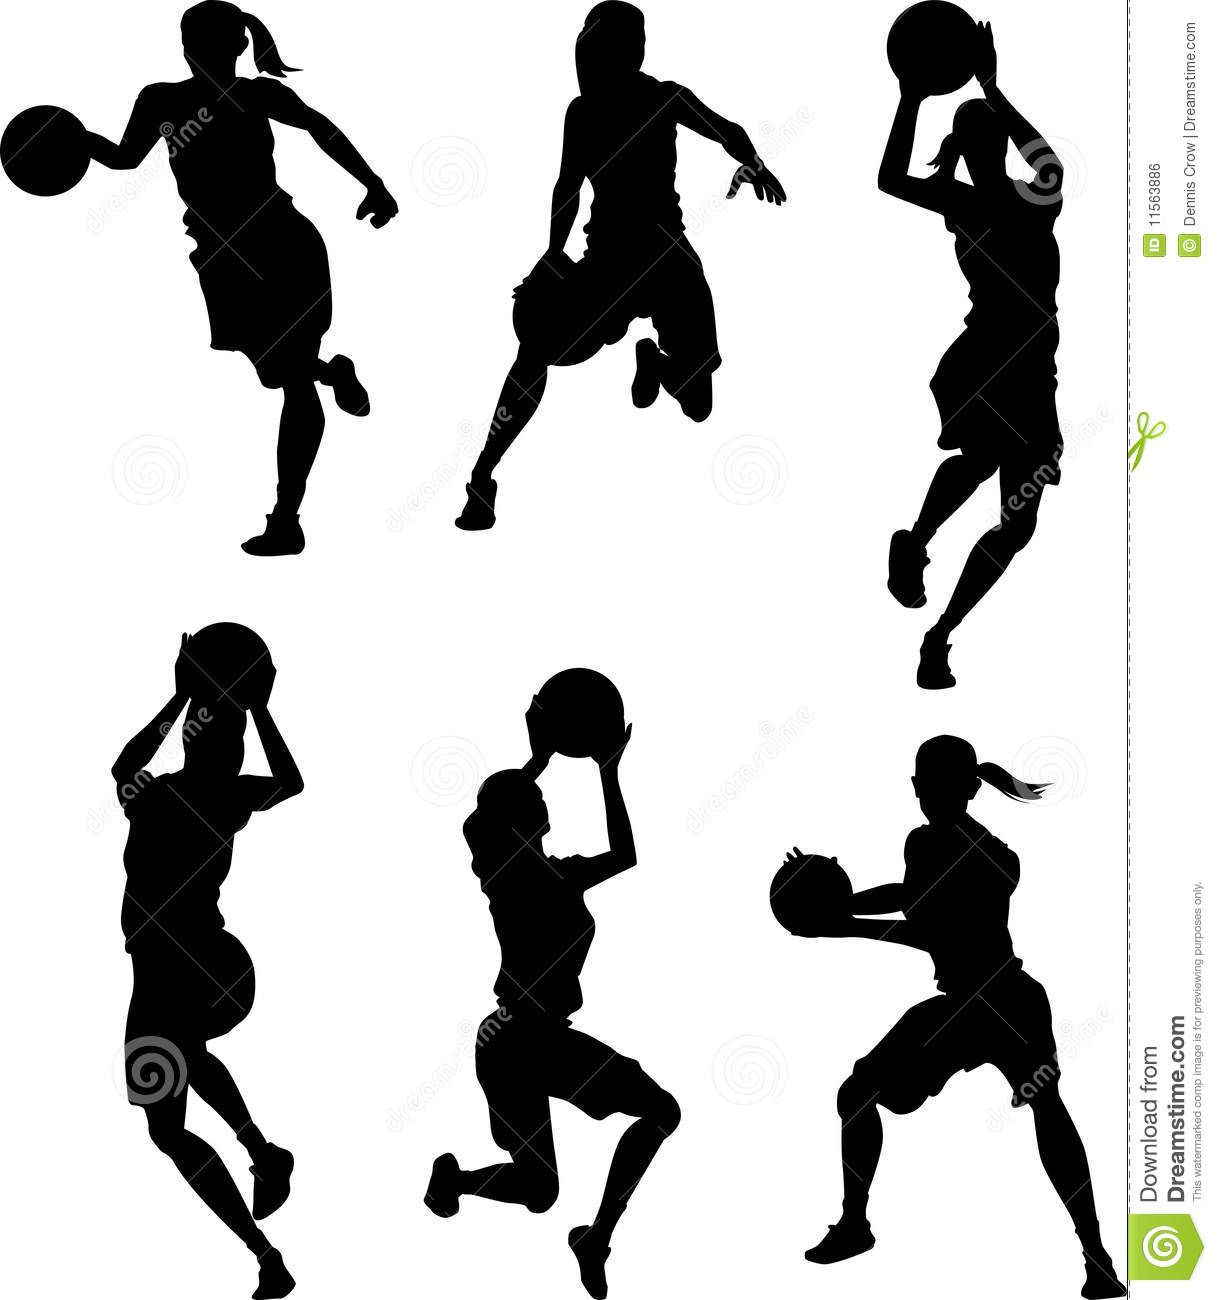 Basketball Female Silhouettes Basketball Silhouette Basketball Girls Basketball Theme